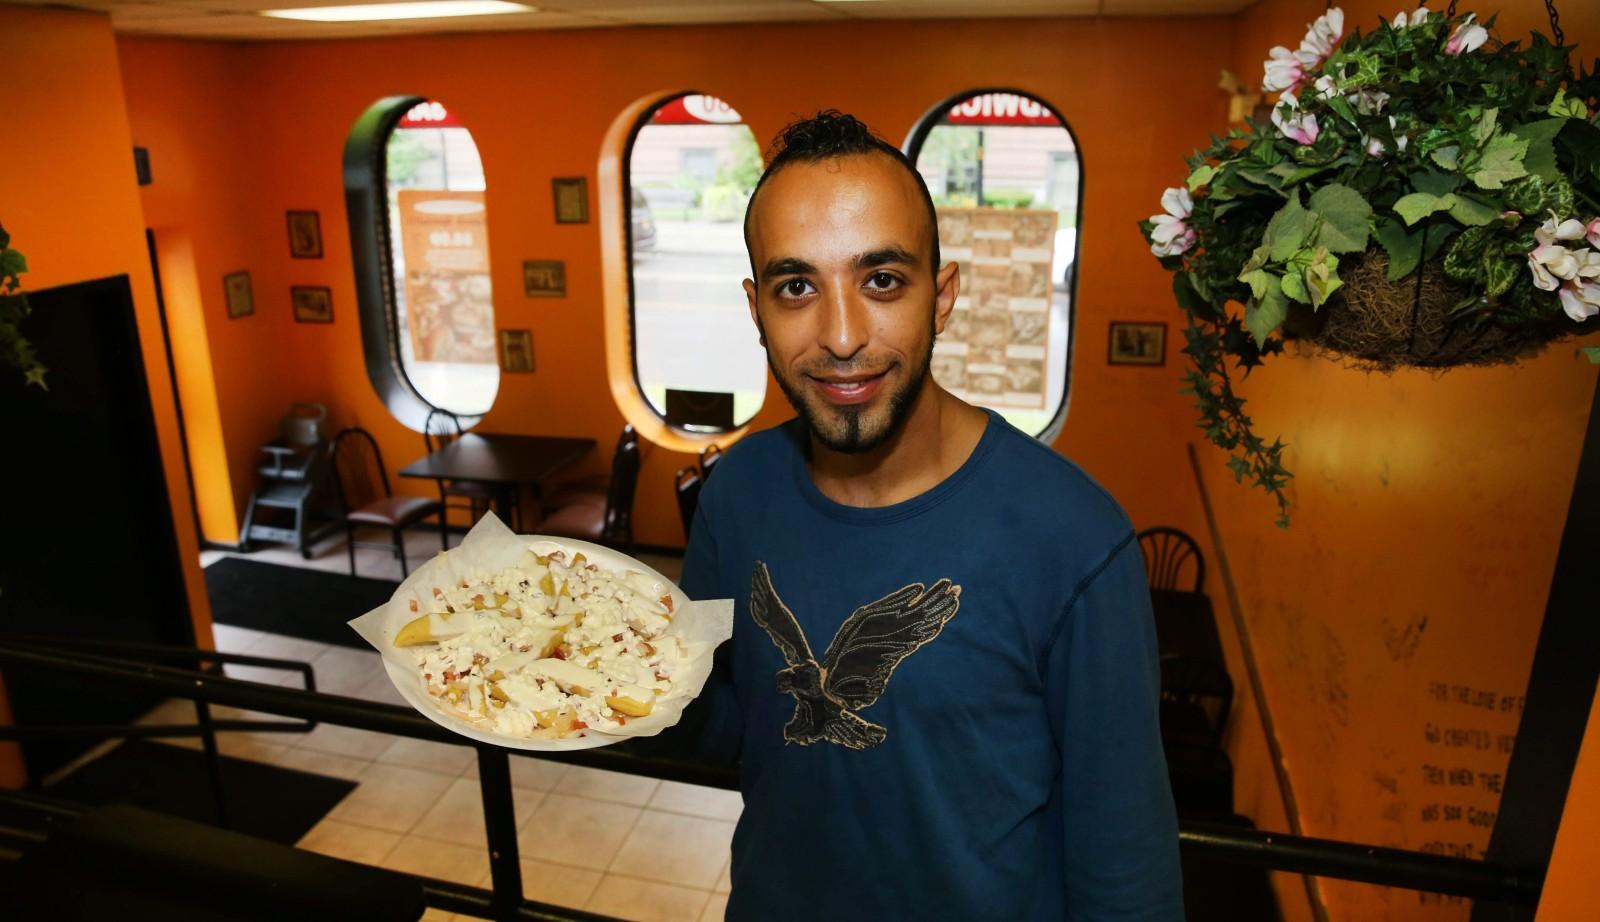 Manager Antewan Fanous presents Venus Mediterranean's popular Greek fries, made with feta cheese, Greek dressing and a housemade garlic sauce. (Sharon Cantillon/Buffalo News)